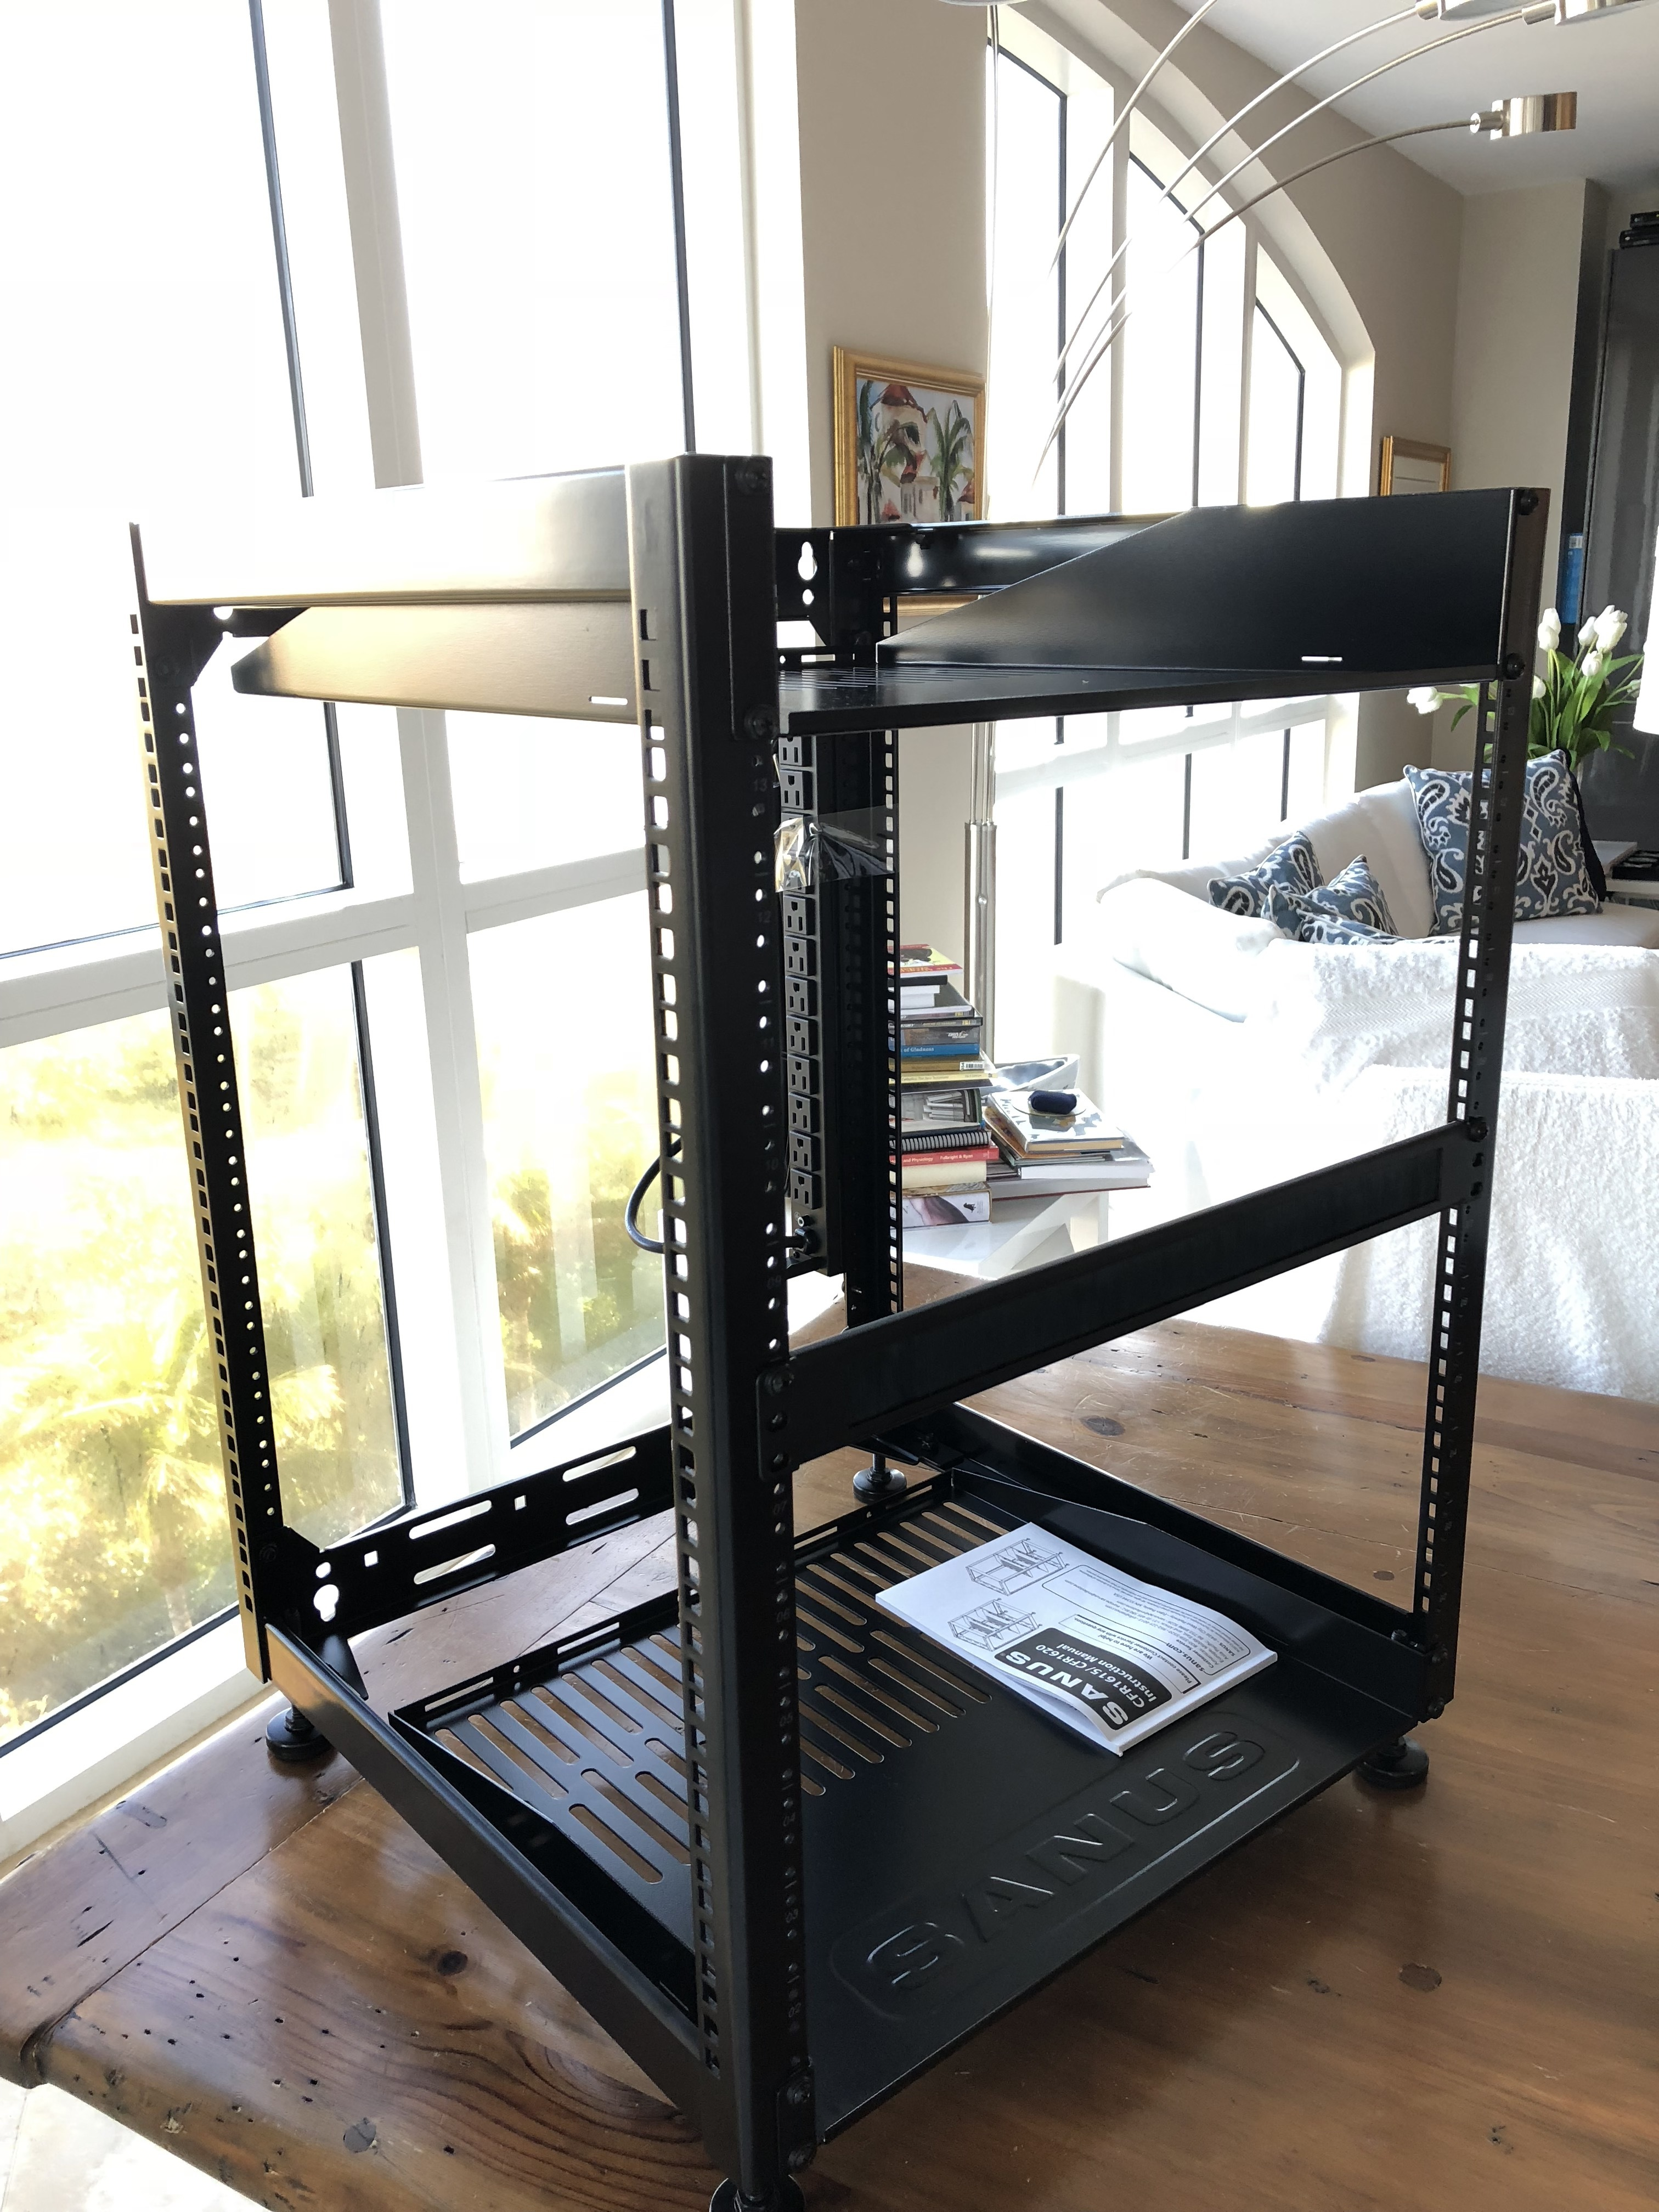 DIY Server/Electronics Rack Using Ikea Cabinets